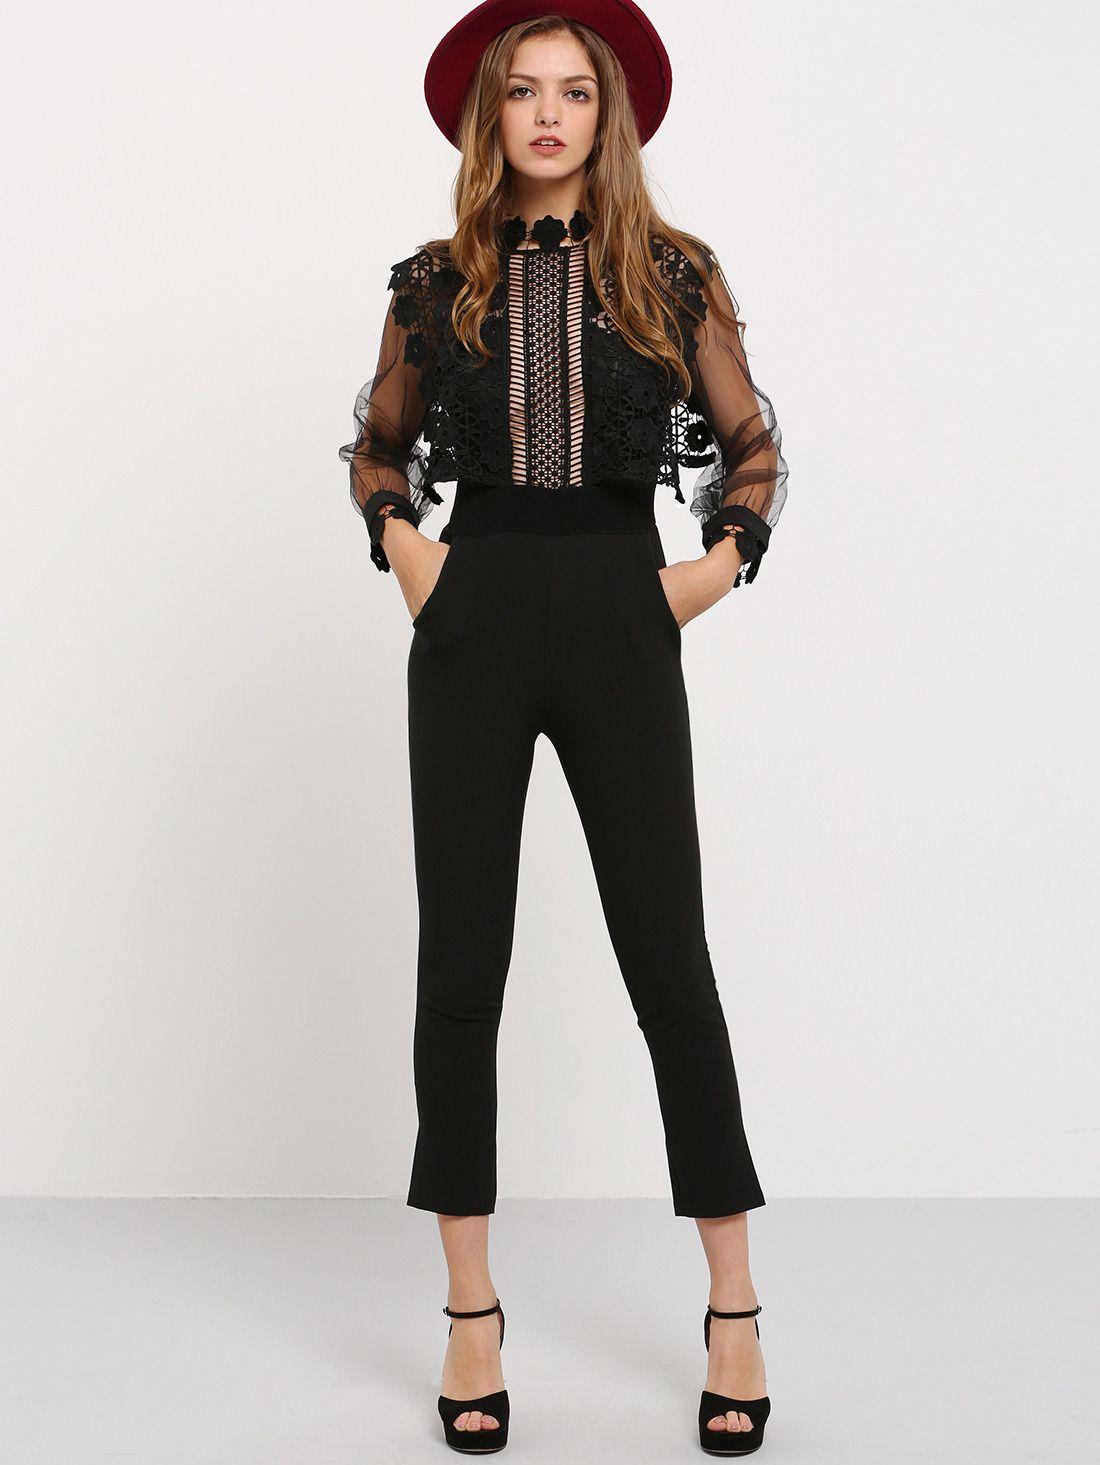 984932403b2c Shop Black Lantern Sleeve Lace Crochet Jumpsuit online. SheIn offers Black  Lantern Sleeve Lace Crochet Jumpsuit   more to fit your fashionable needs.